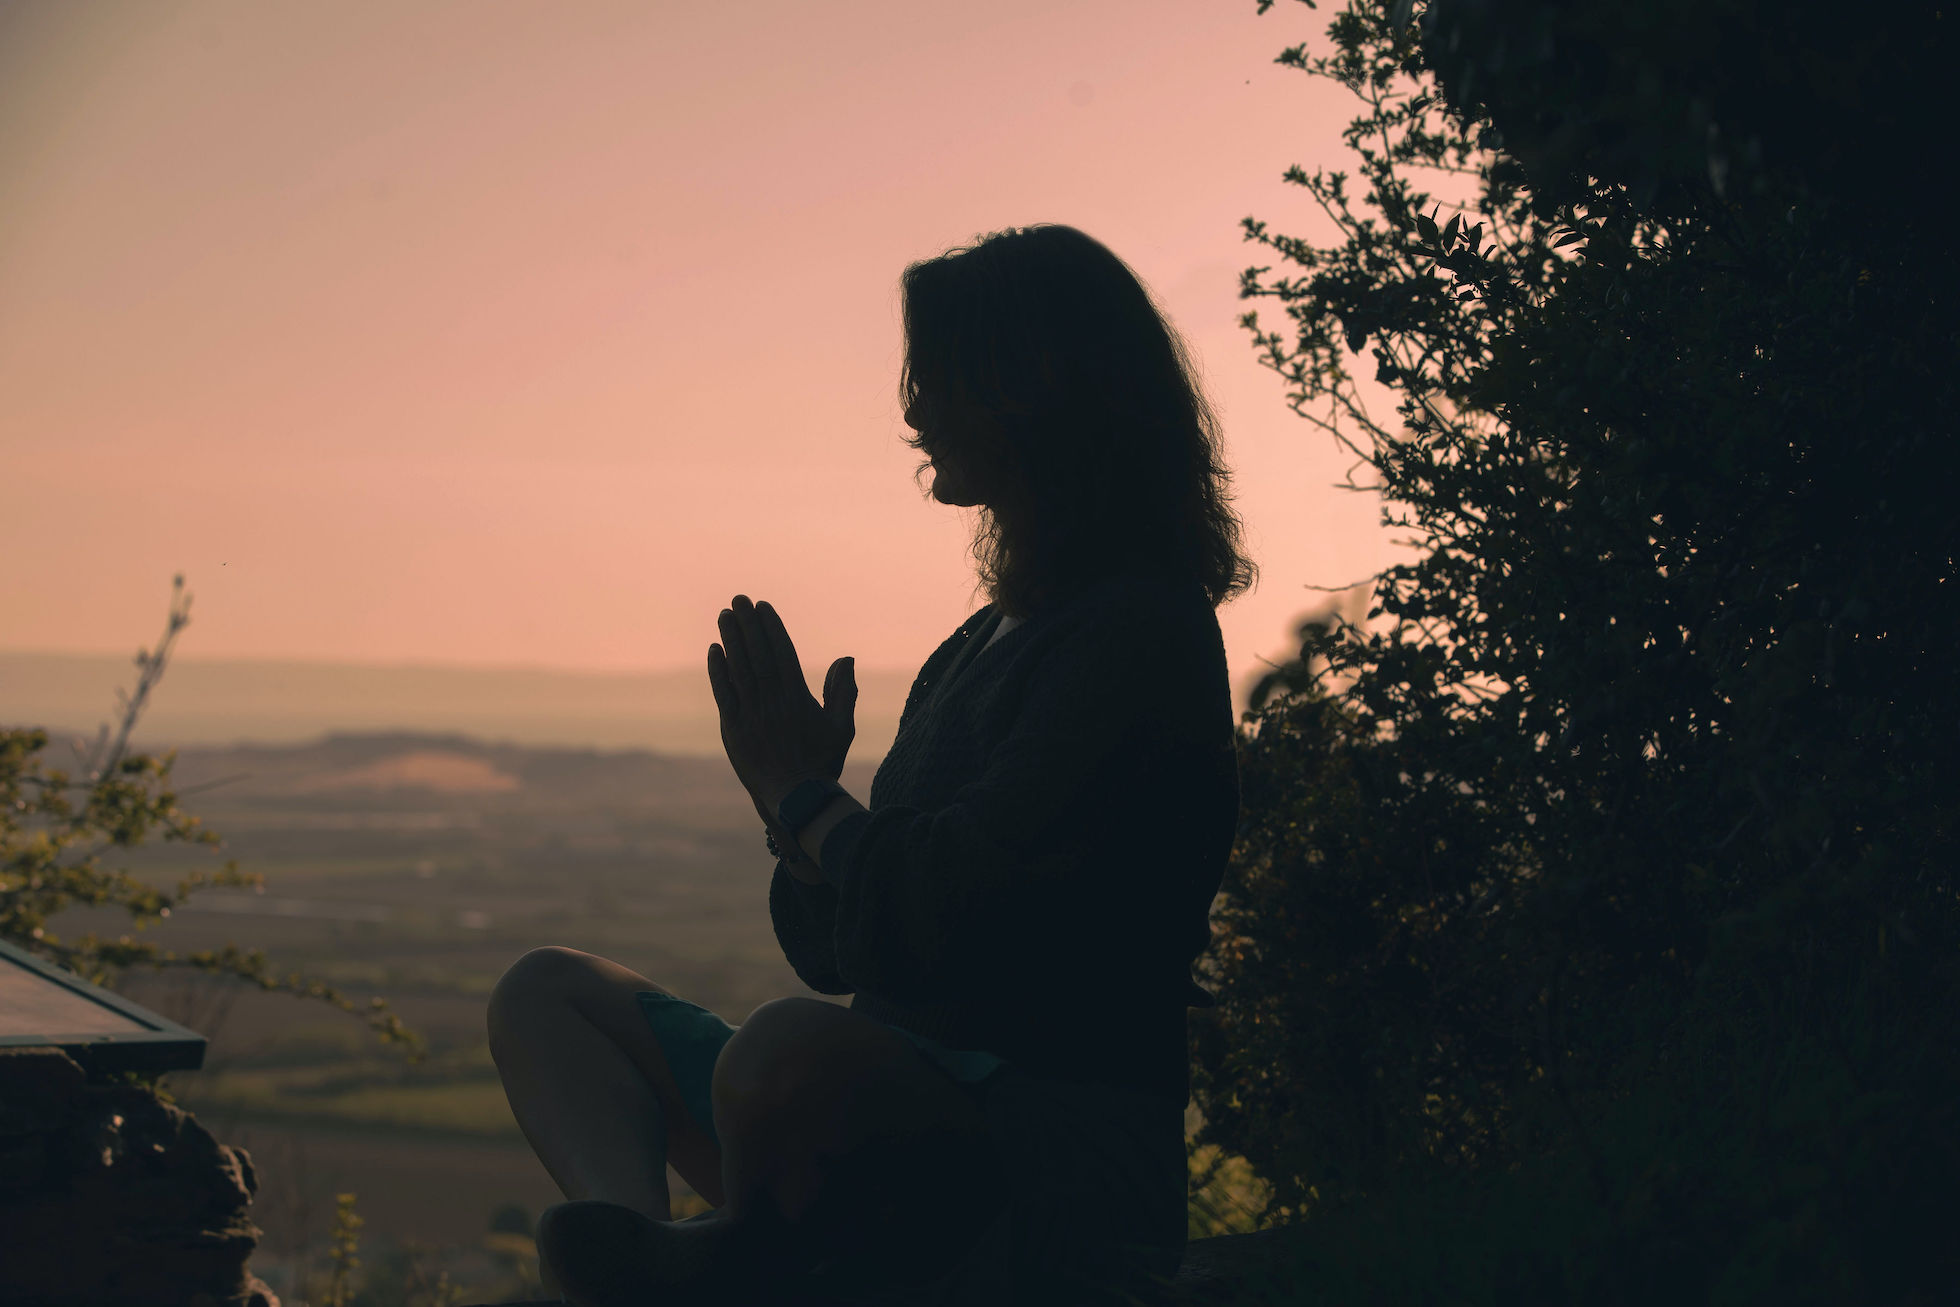 meditation silhoutte